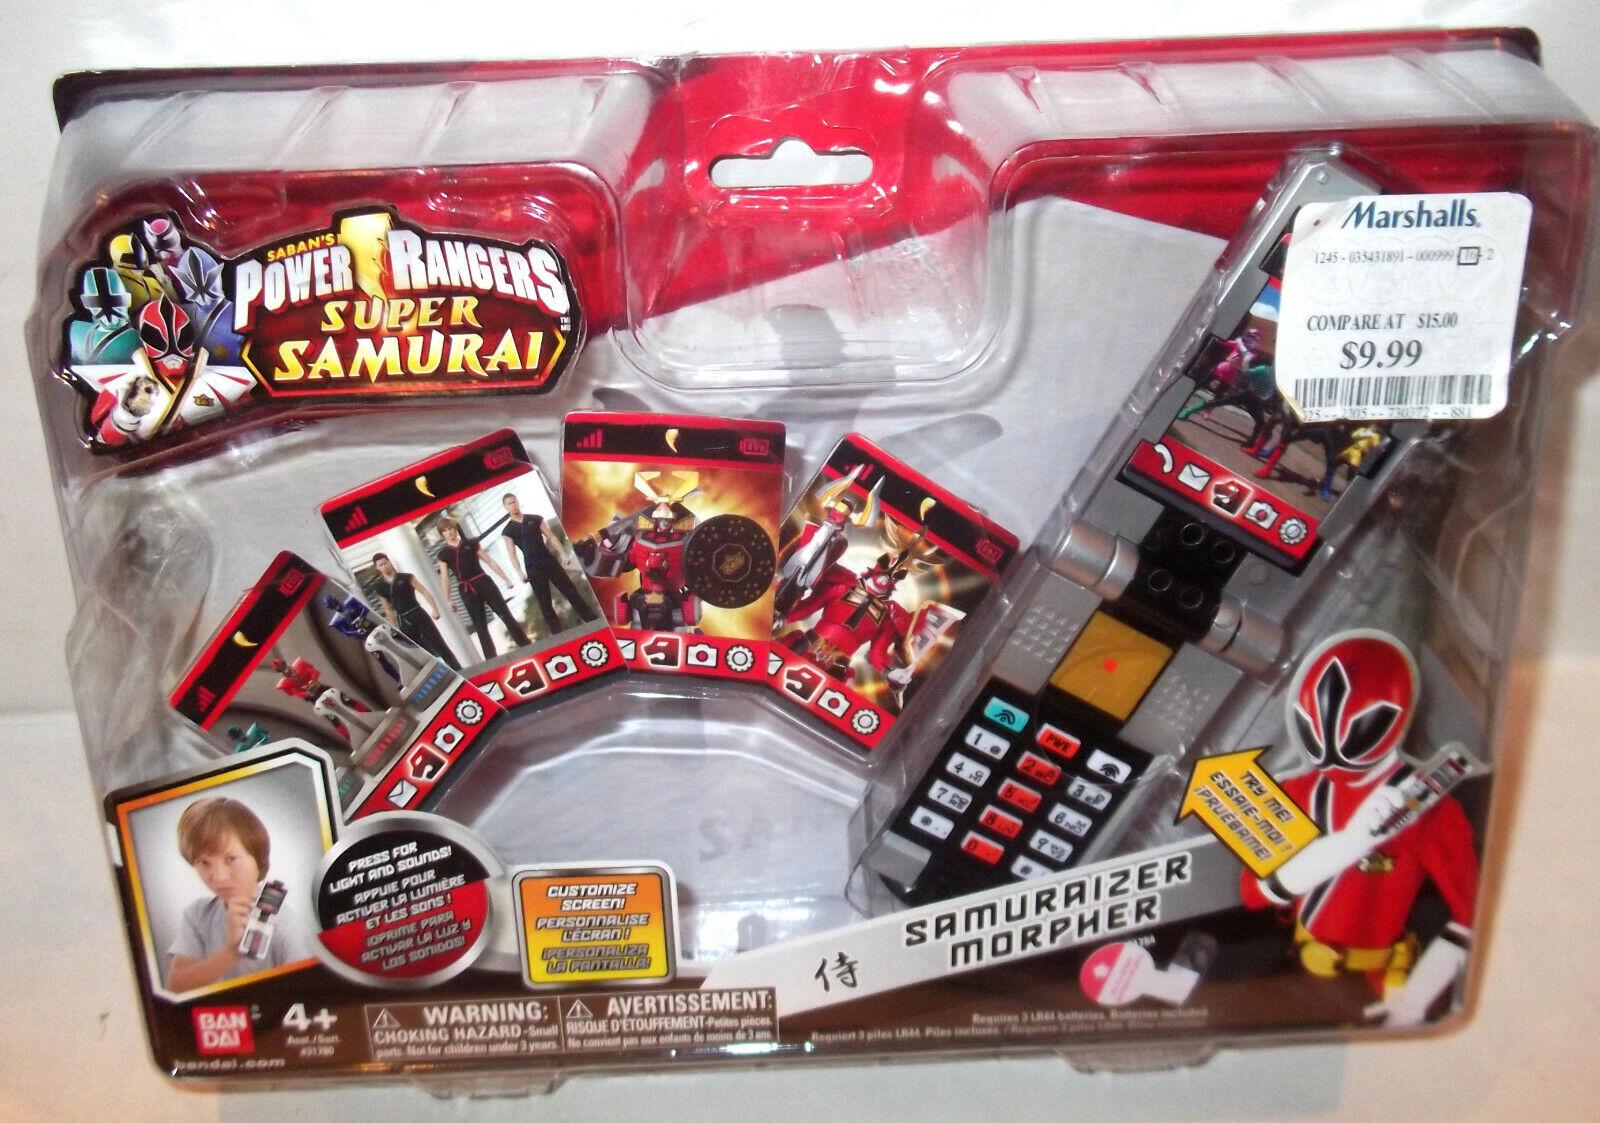 ✰ HOT HOT ✰ Power Rangers SUPER Samuraizer PHONE MORPHER ✰ role play ✰ NEW MISB